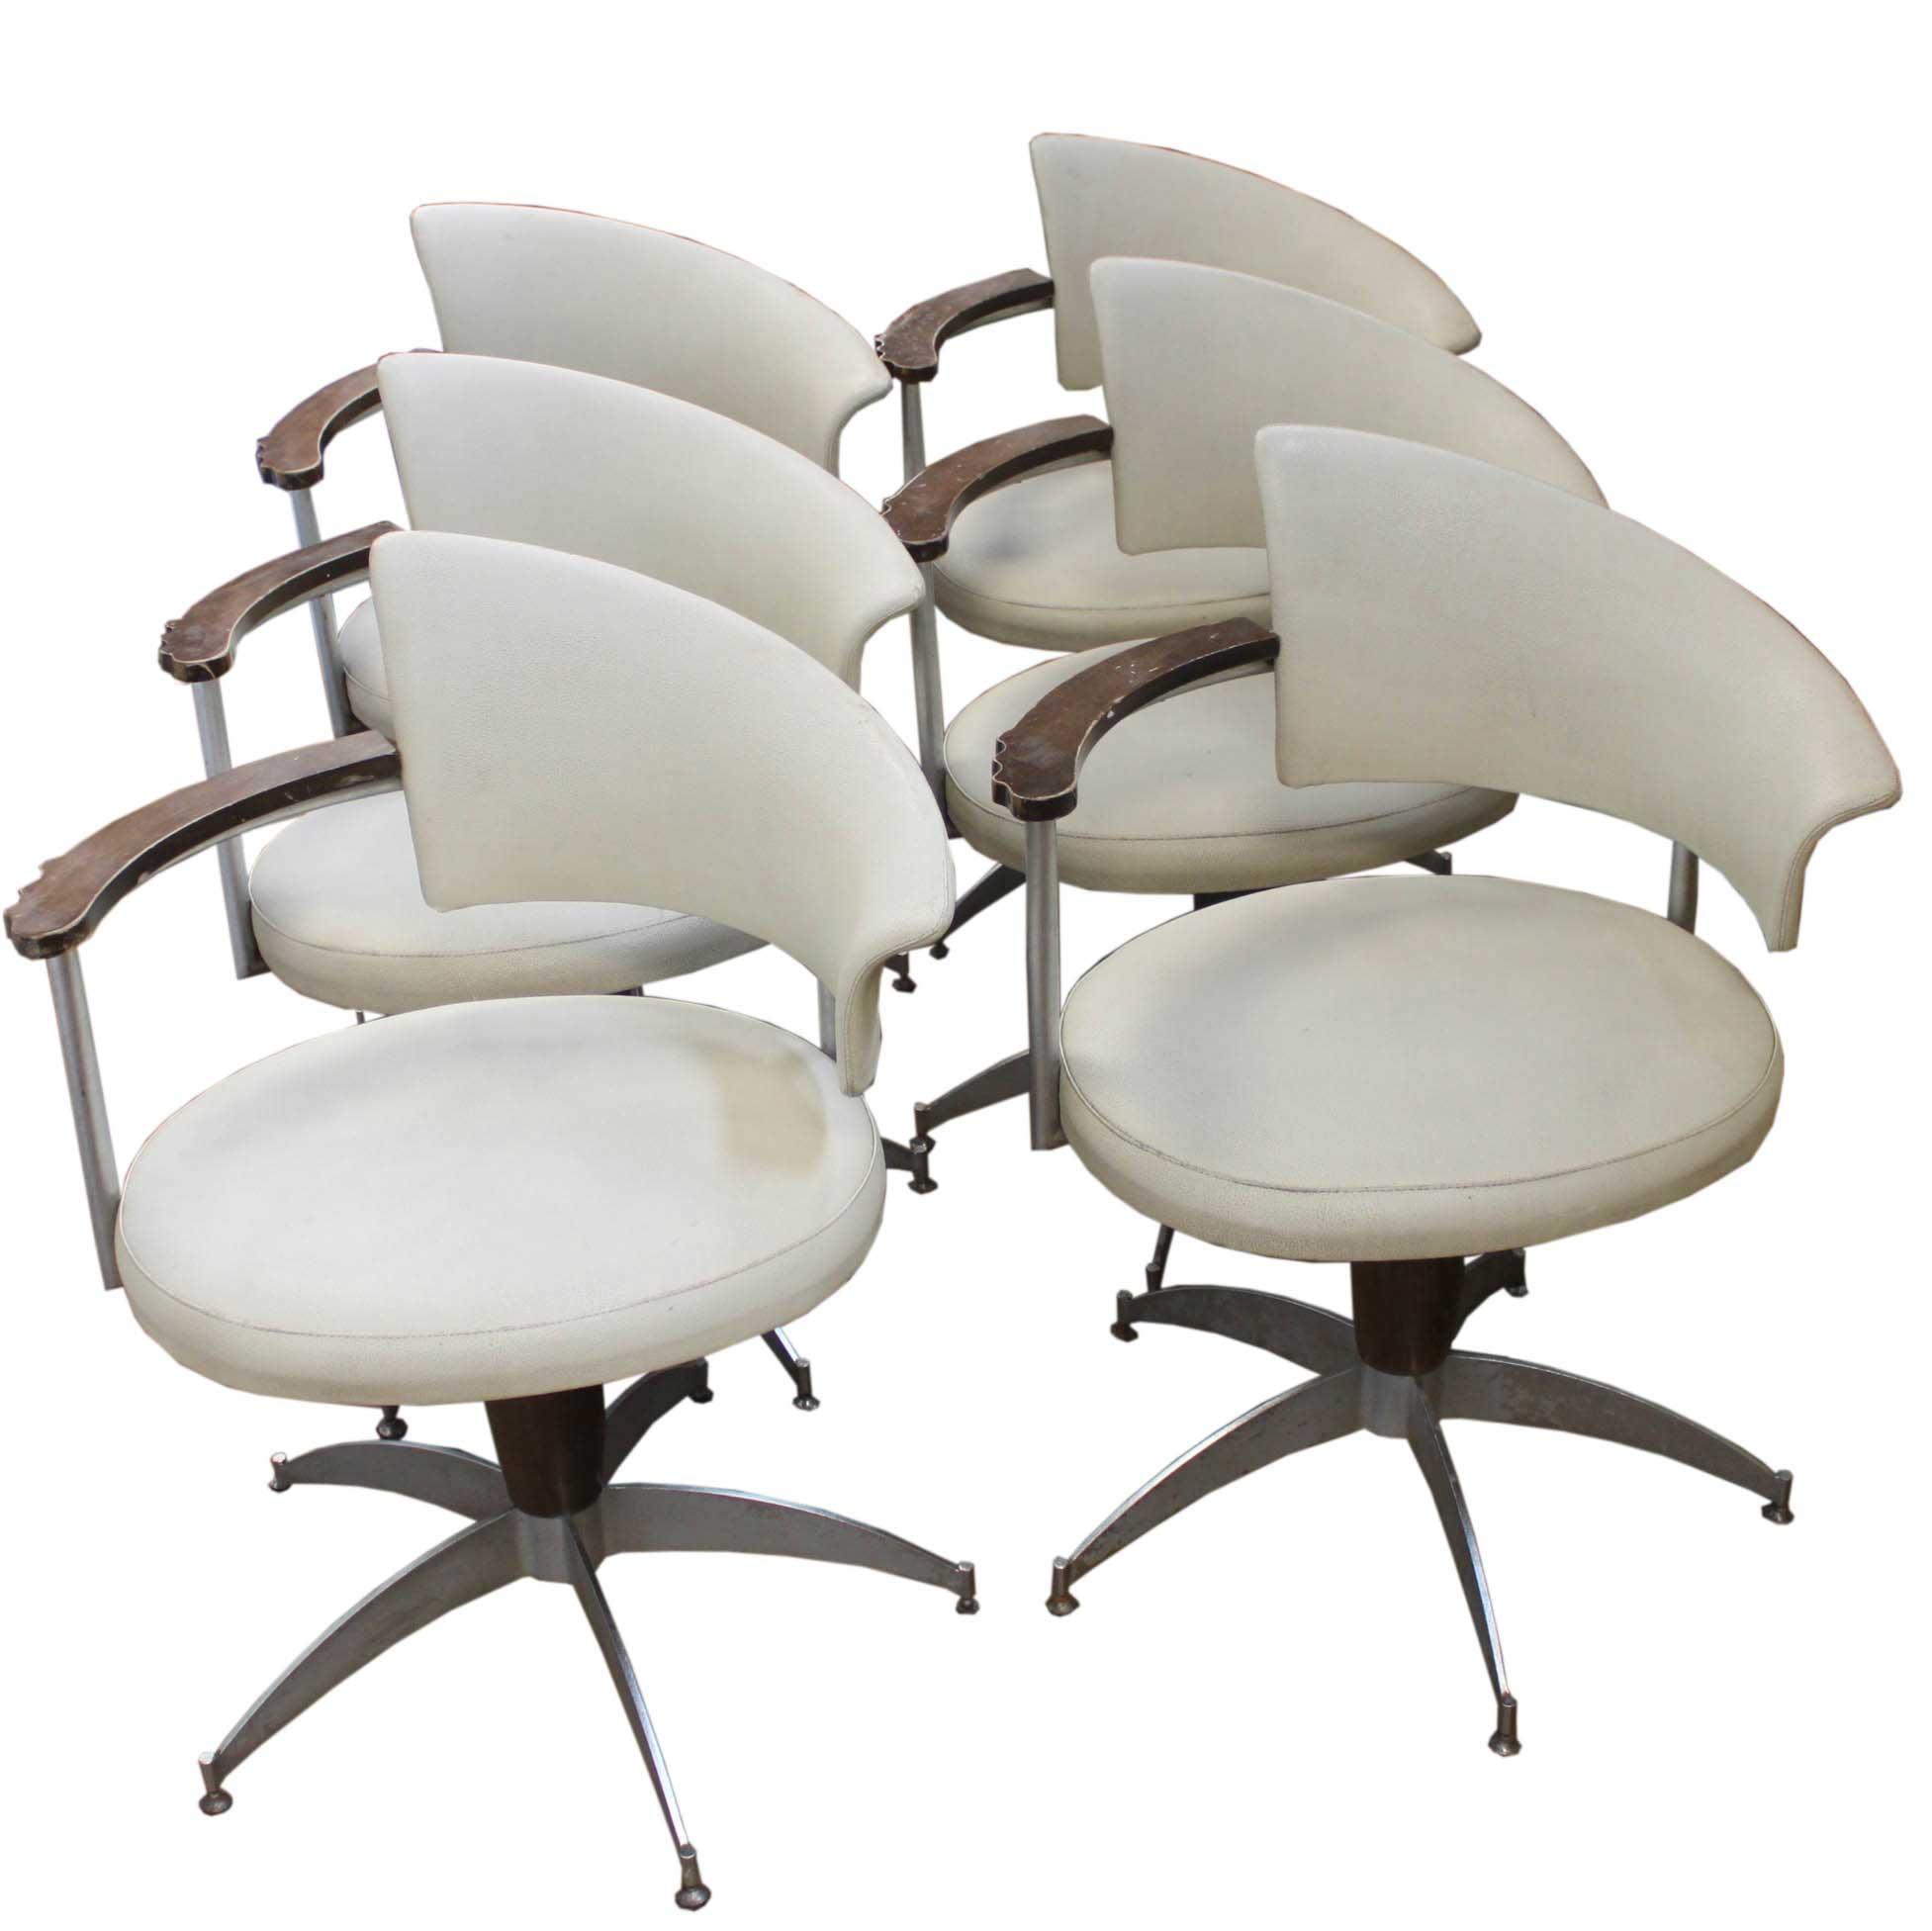 swivel chair price philippines cedar adirondack chairs canada set of four italian cream and metal